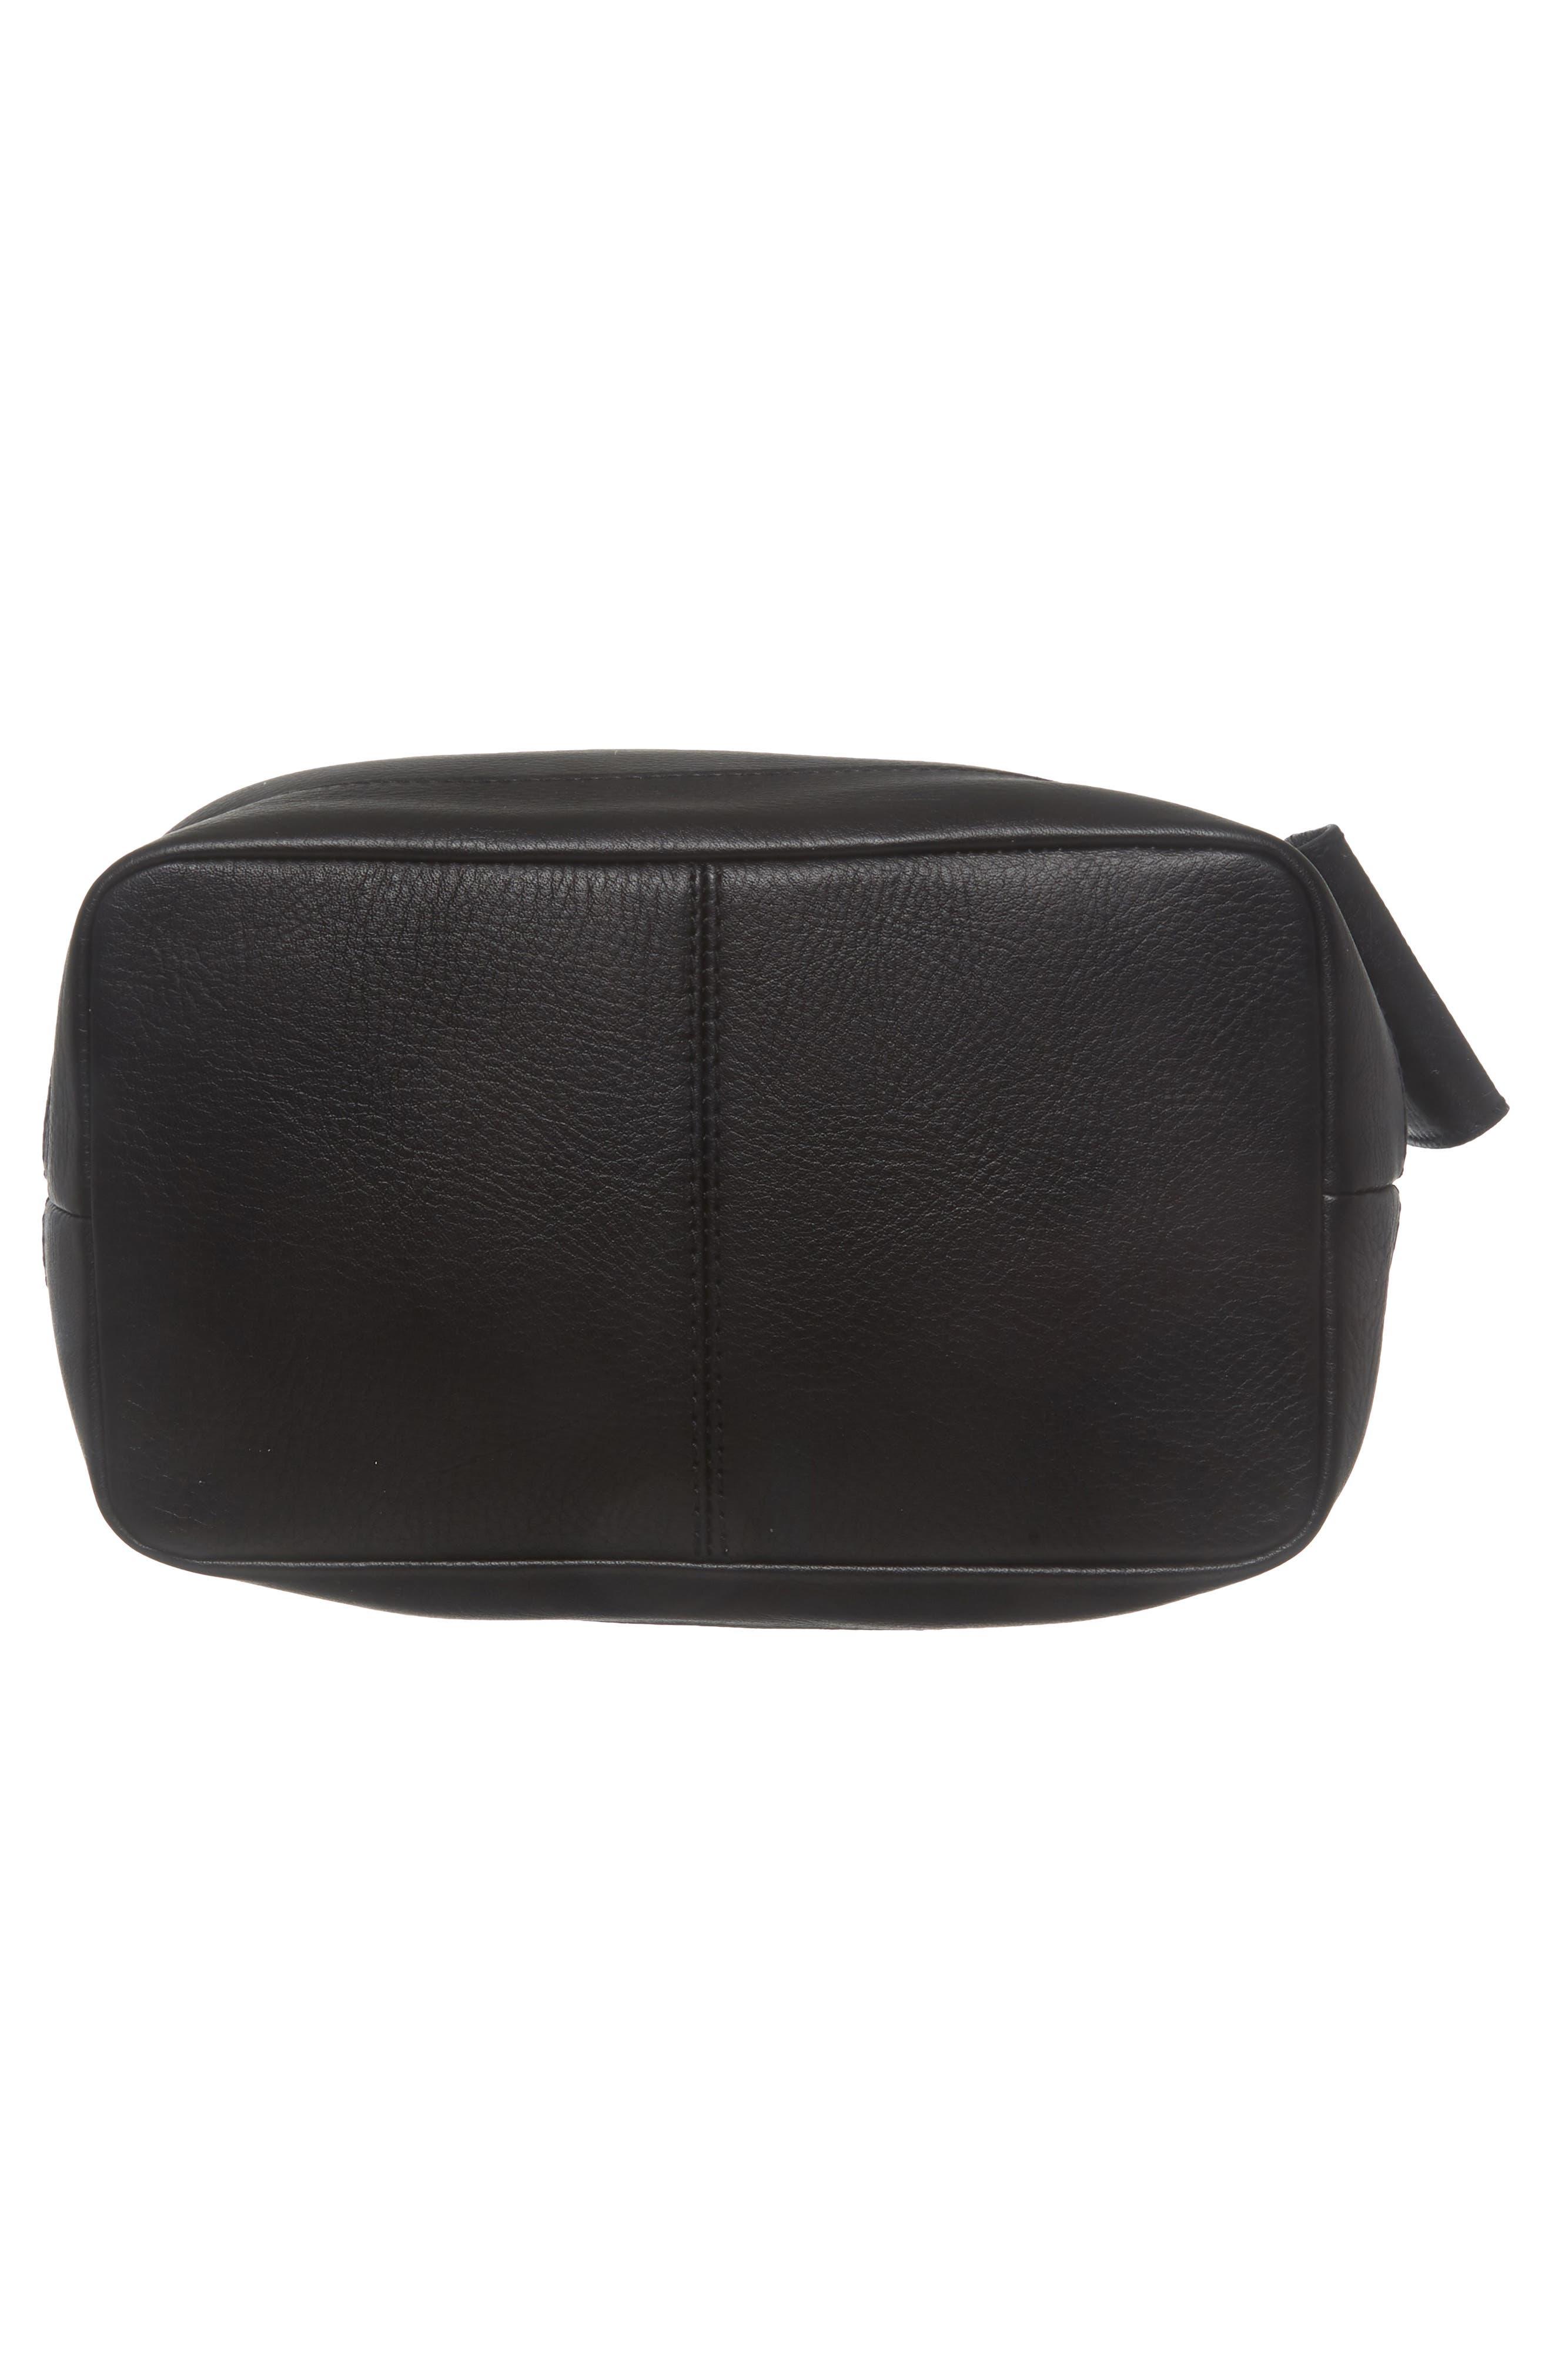 Lafayette Leather Bucket Bag,                             Alternate thumbnail 6, color,                             True Black